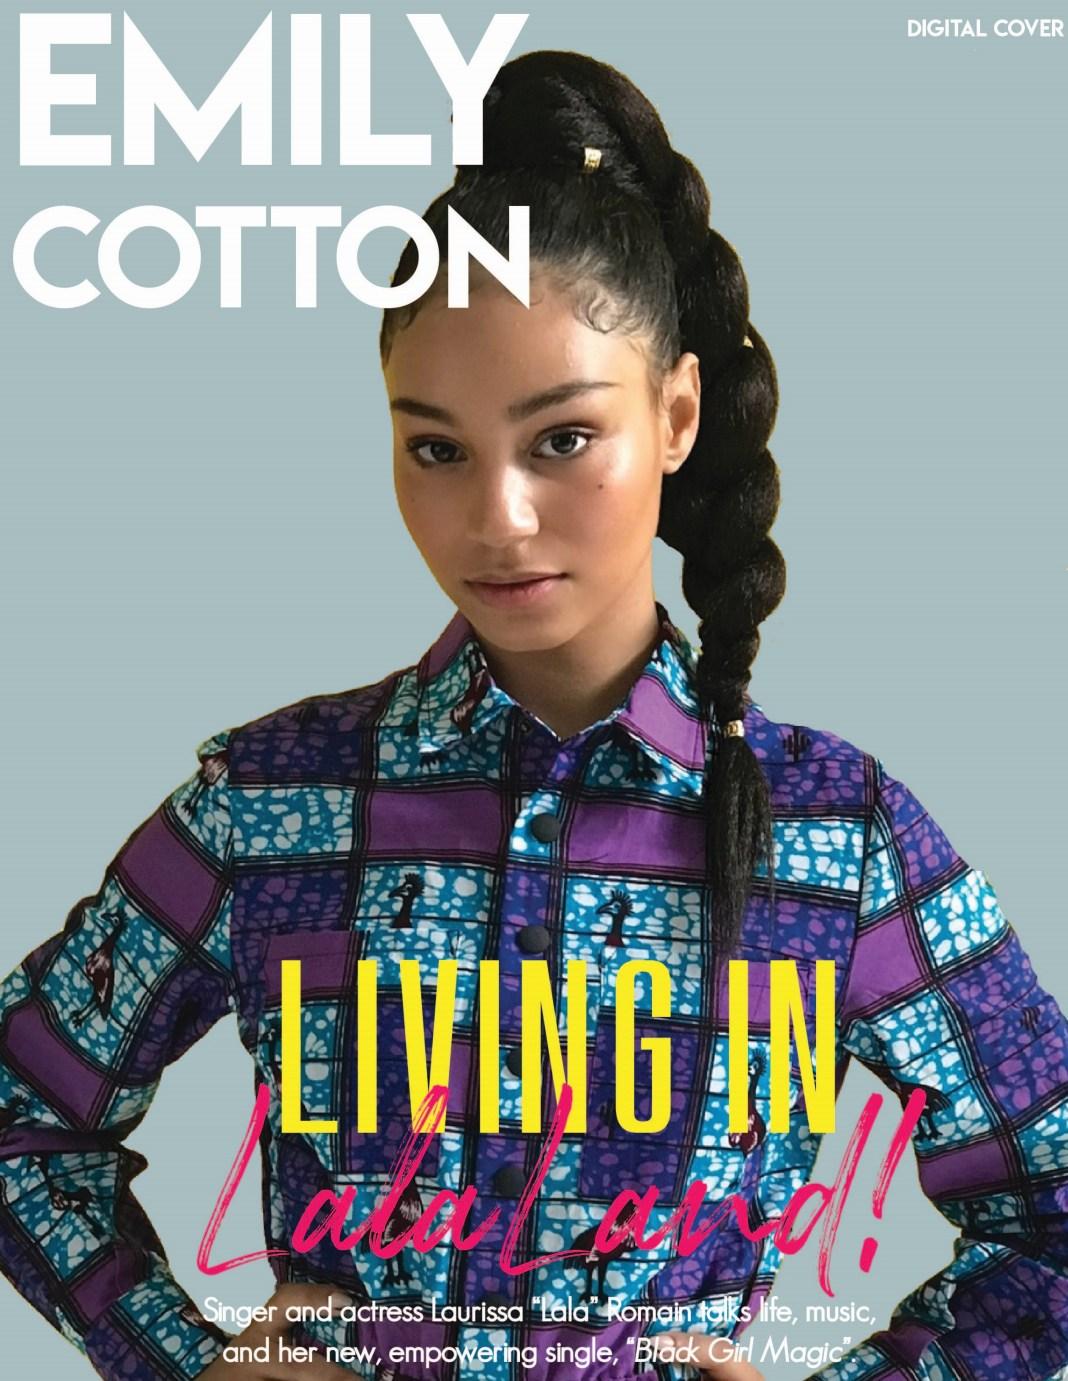 Digital Cover - living in LA LA Land